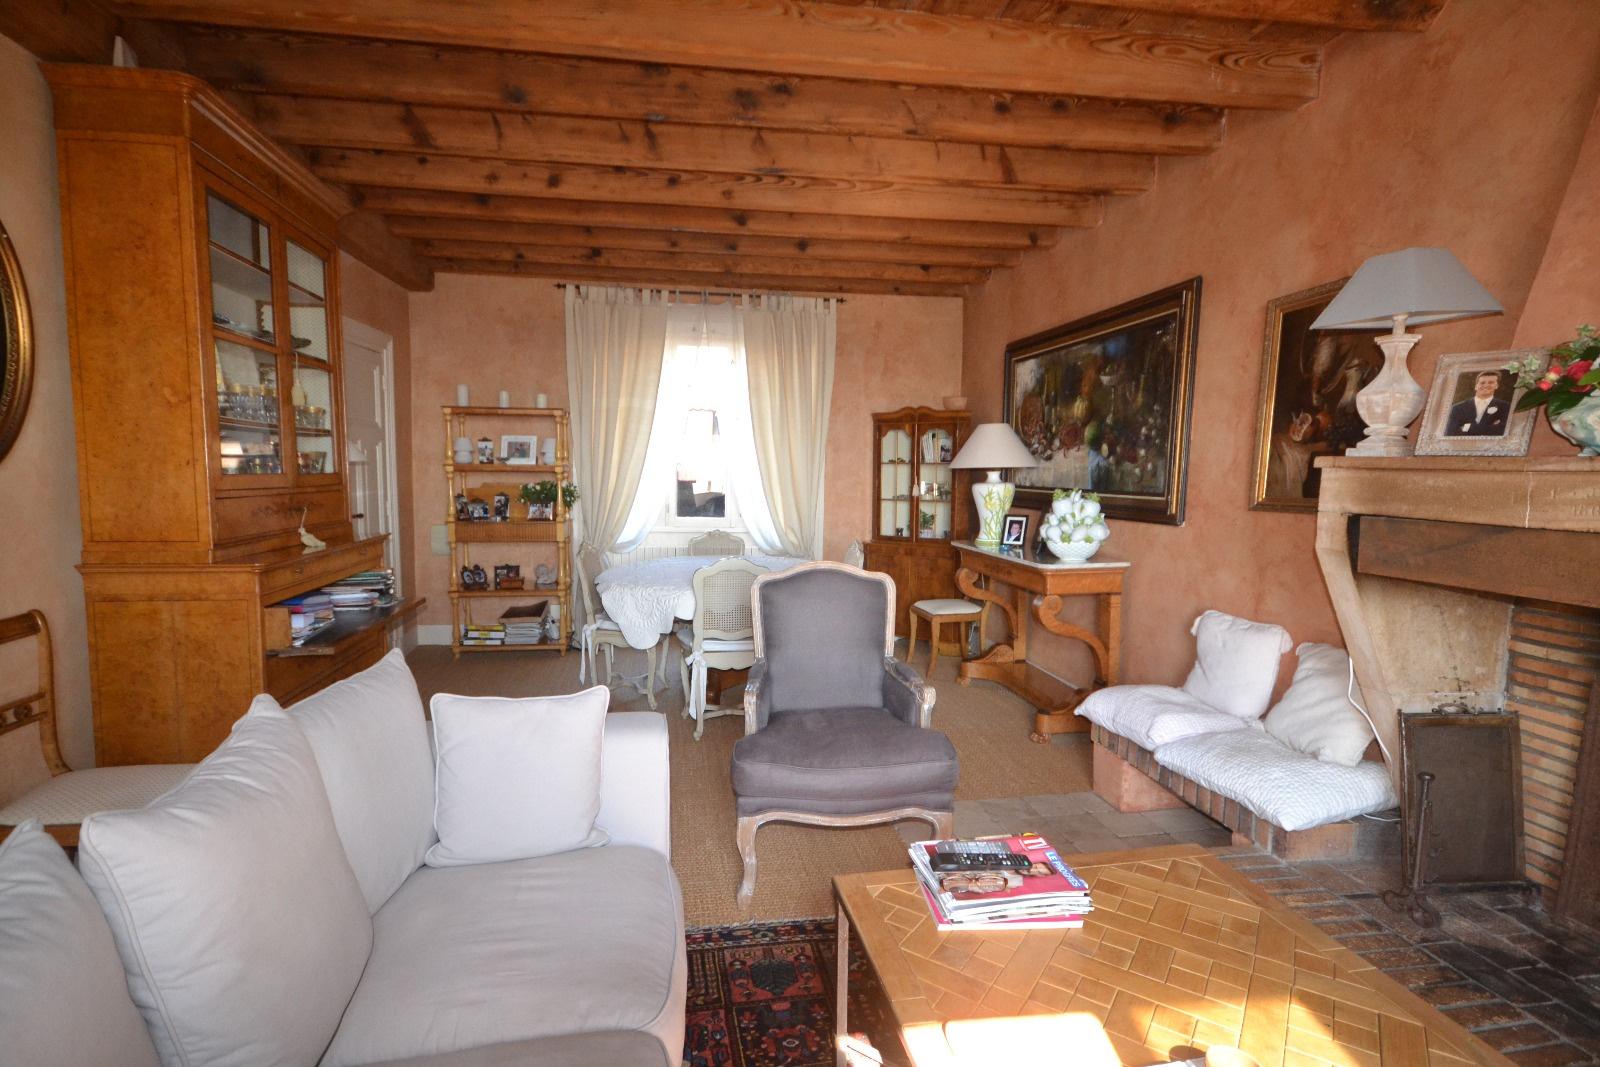 Vente beaujolais pierres dorees proche tout acces for Acheter maison beaujolais